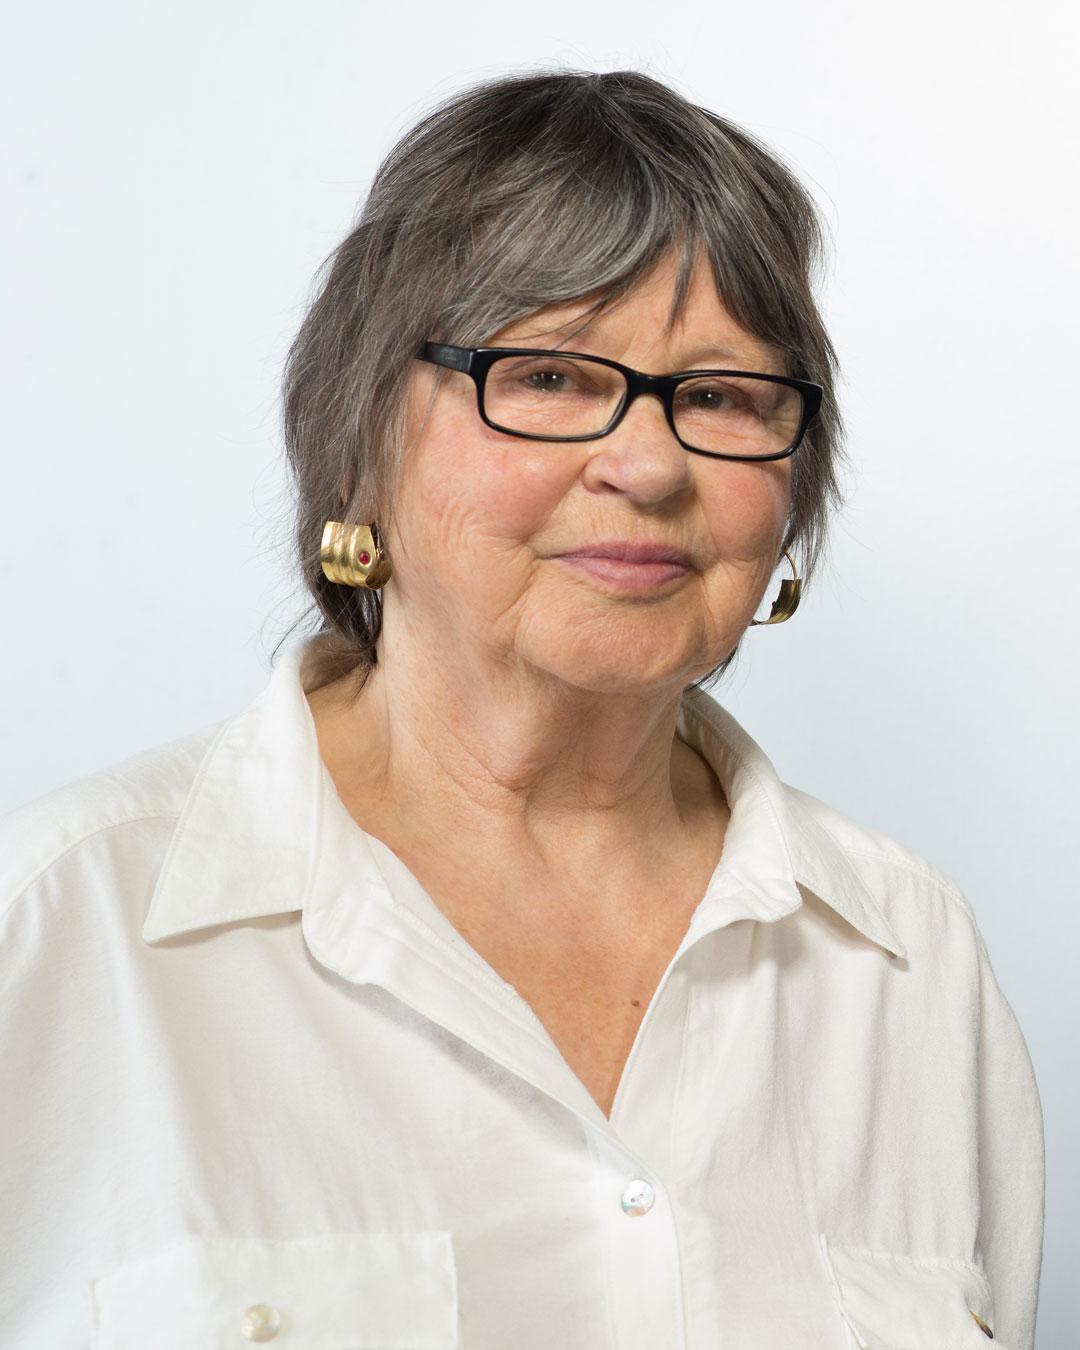 Dorothea Prühl